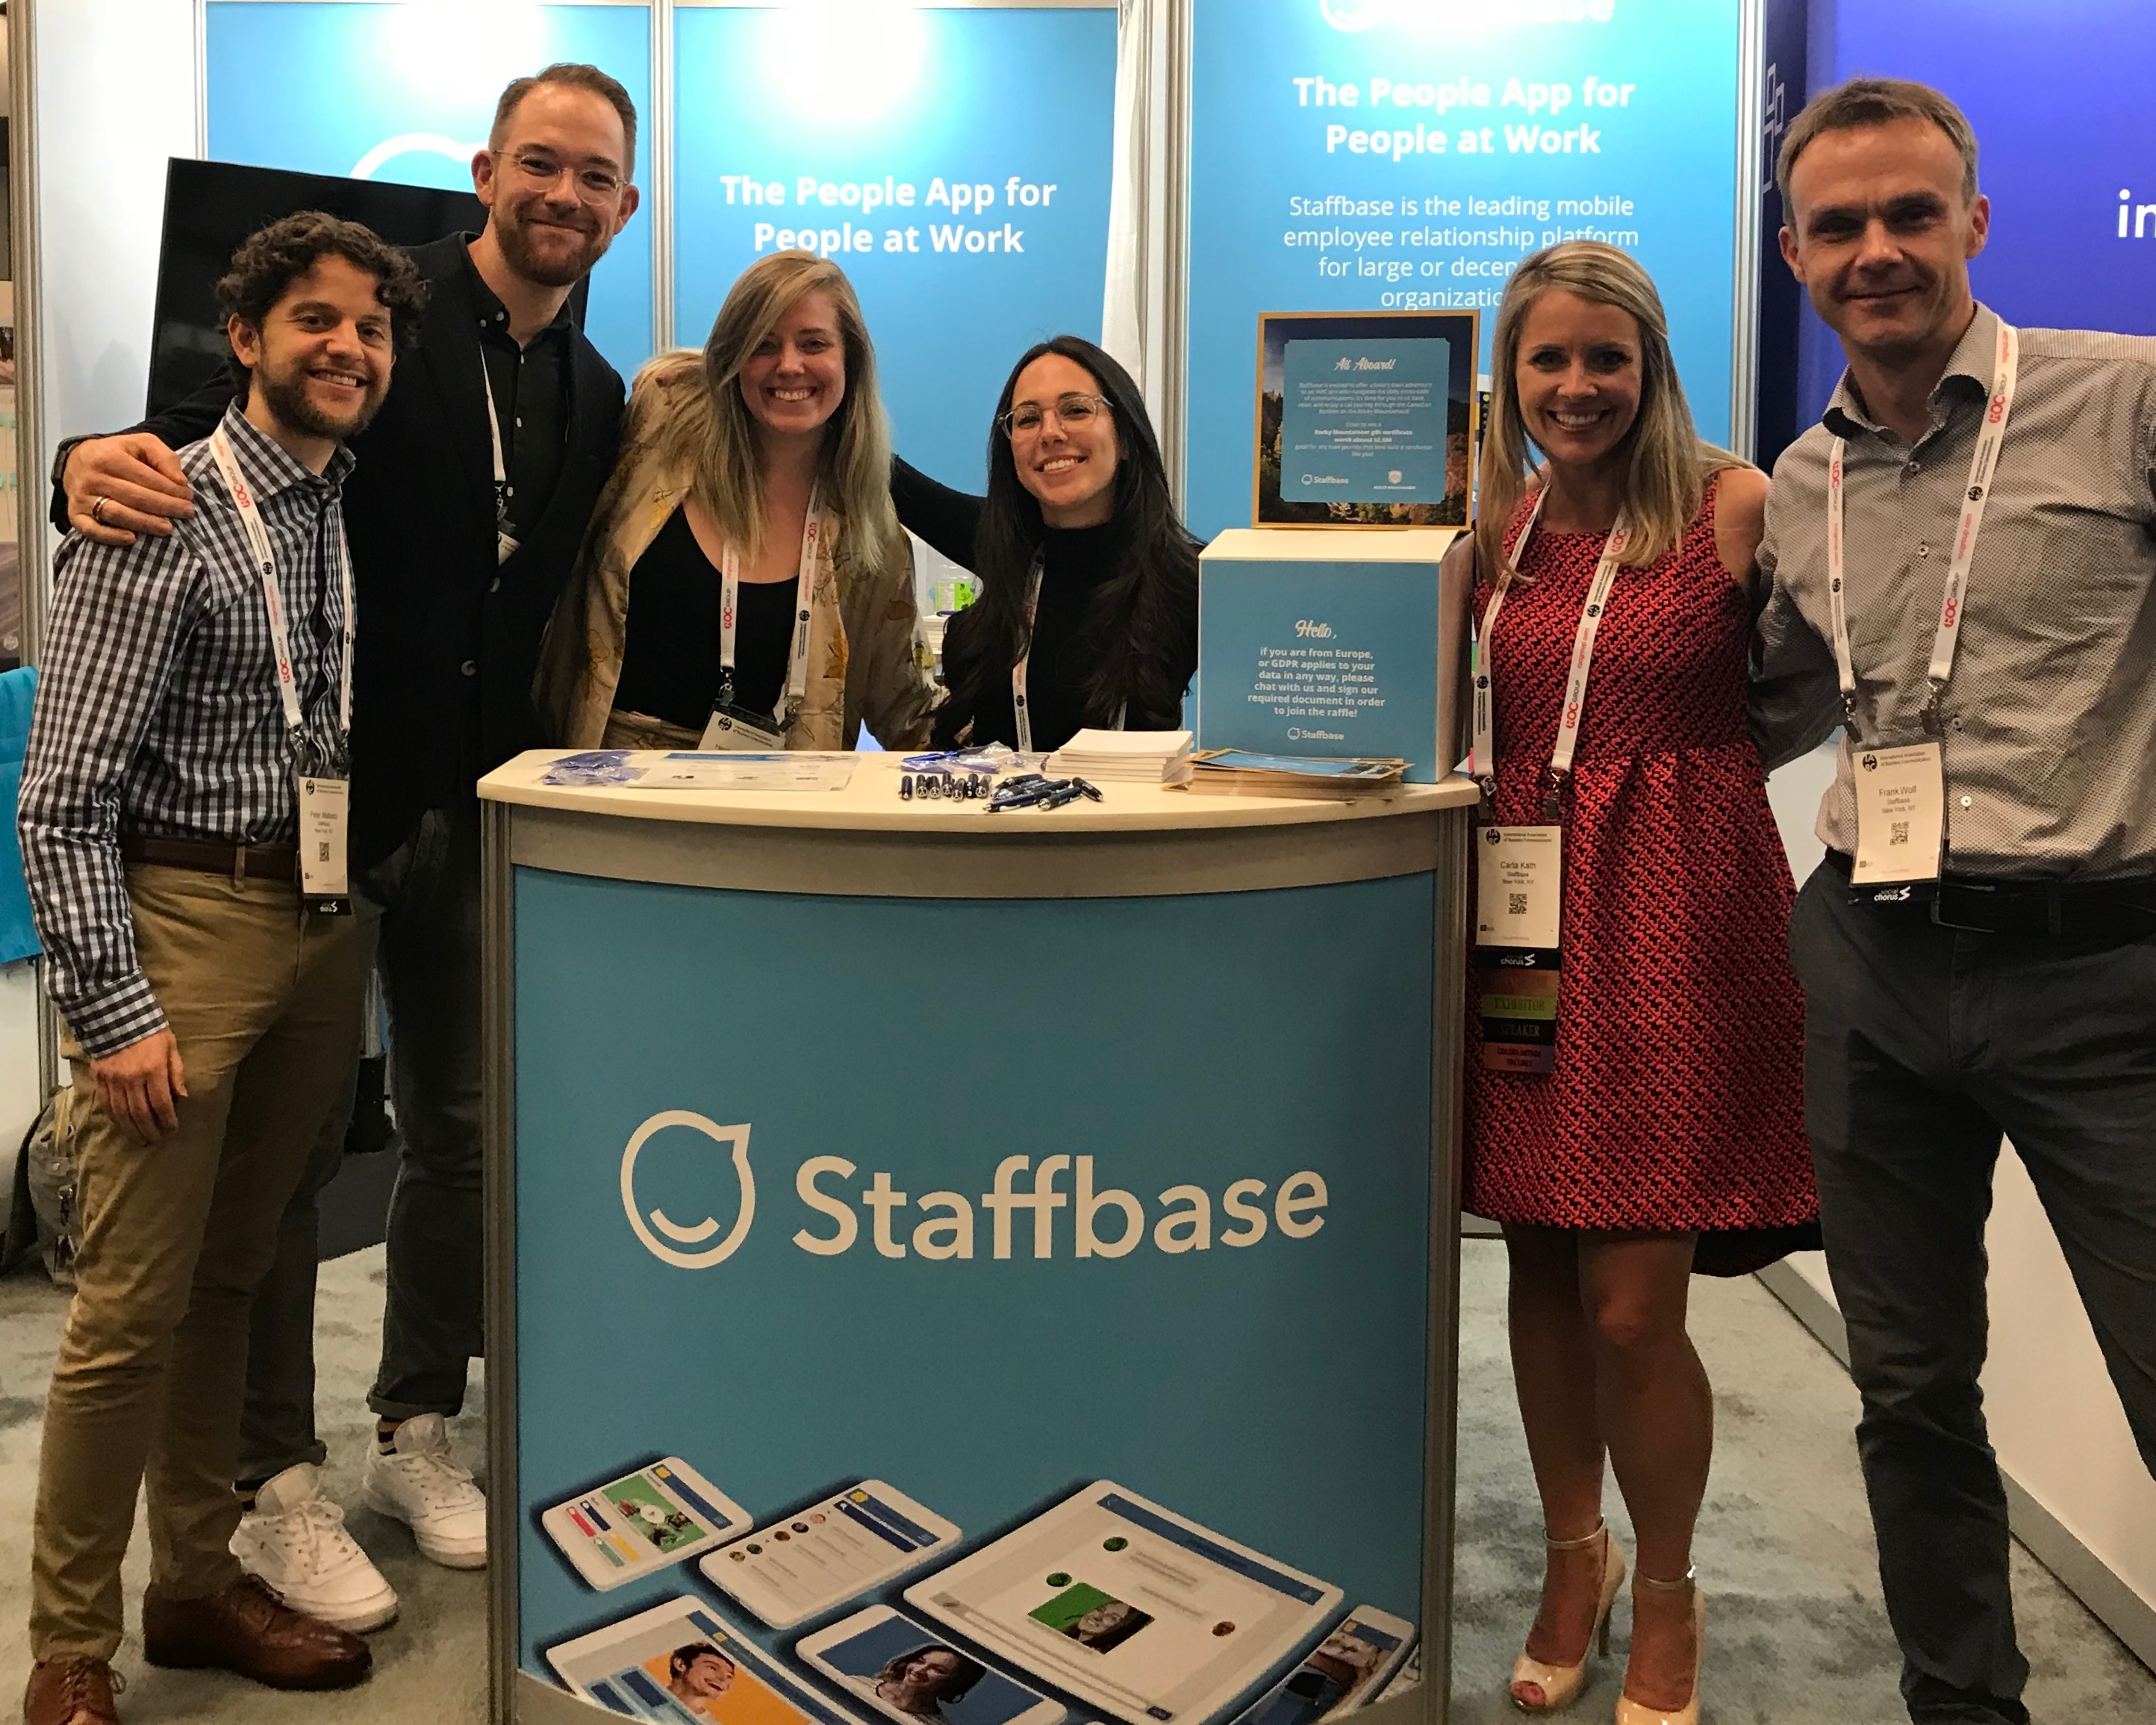 Staffbase at IABC 2018